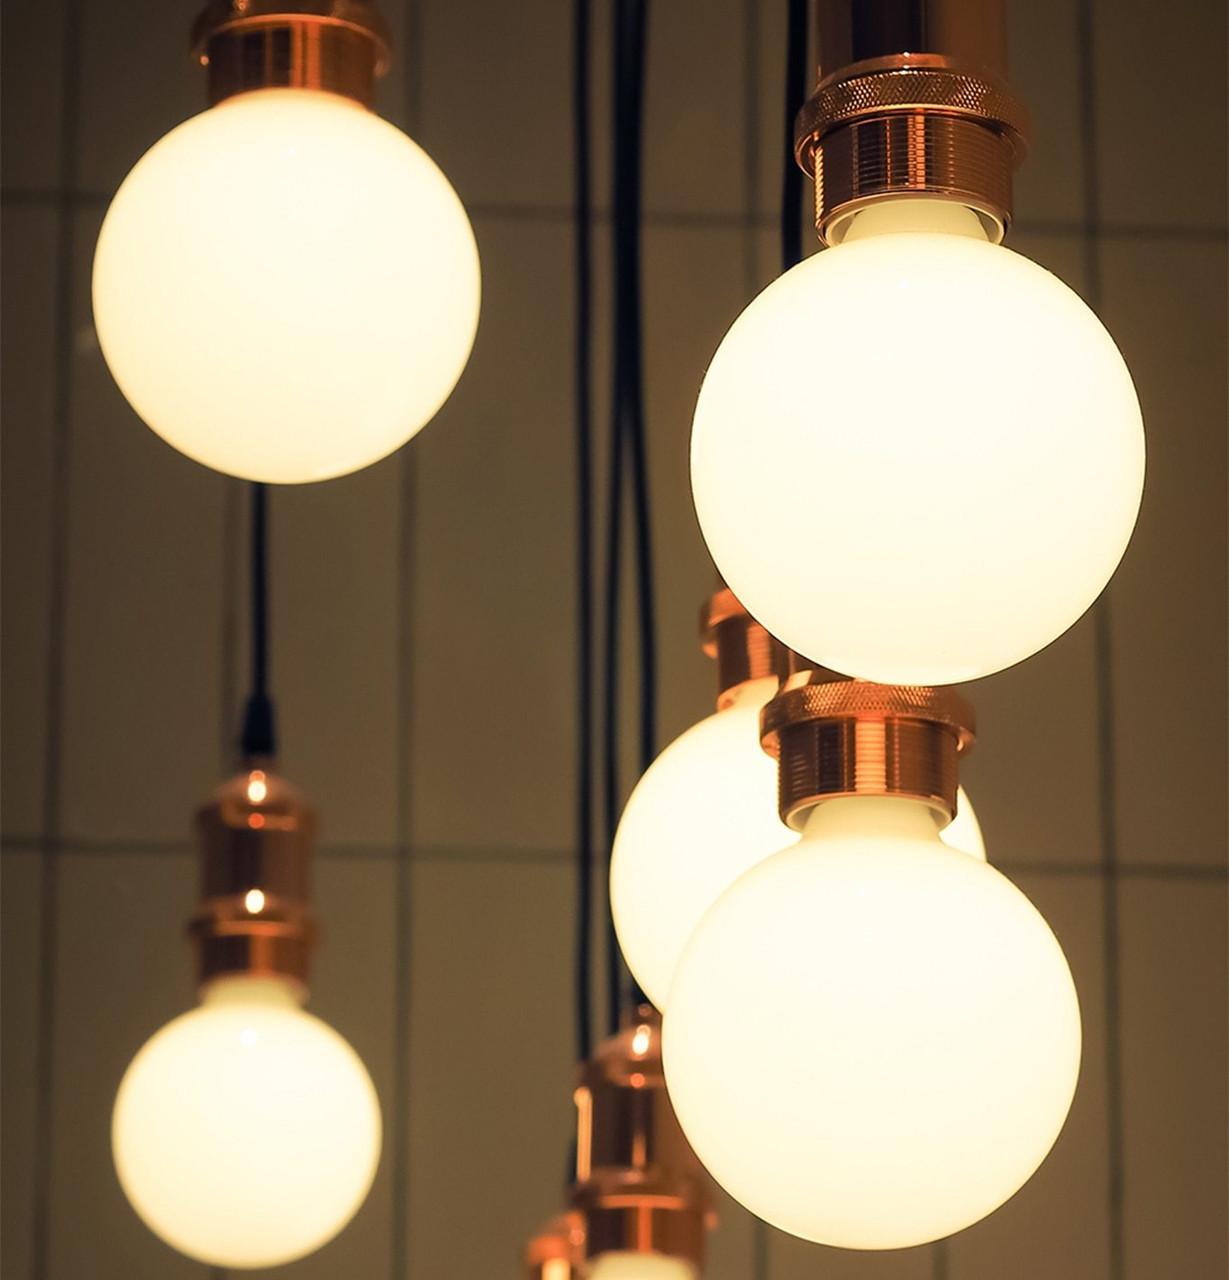 LED Globe B22 Light Bulbs